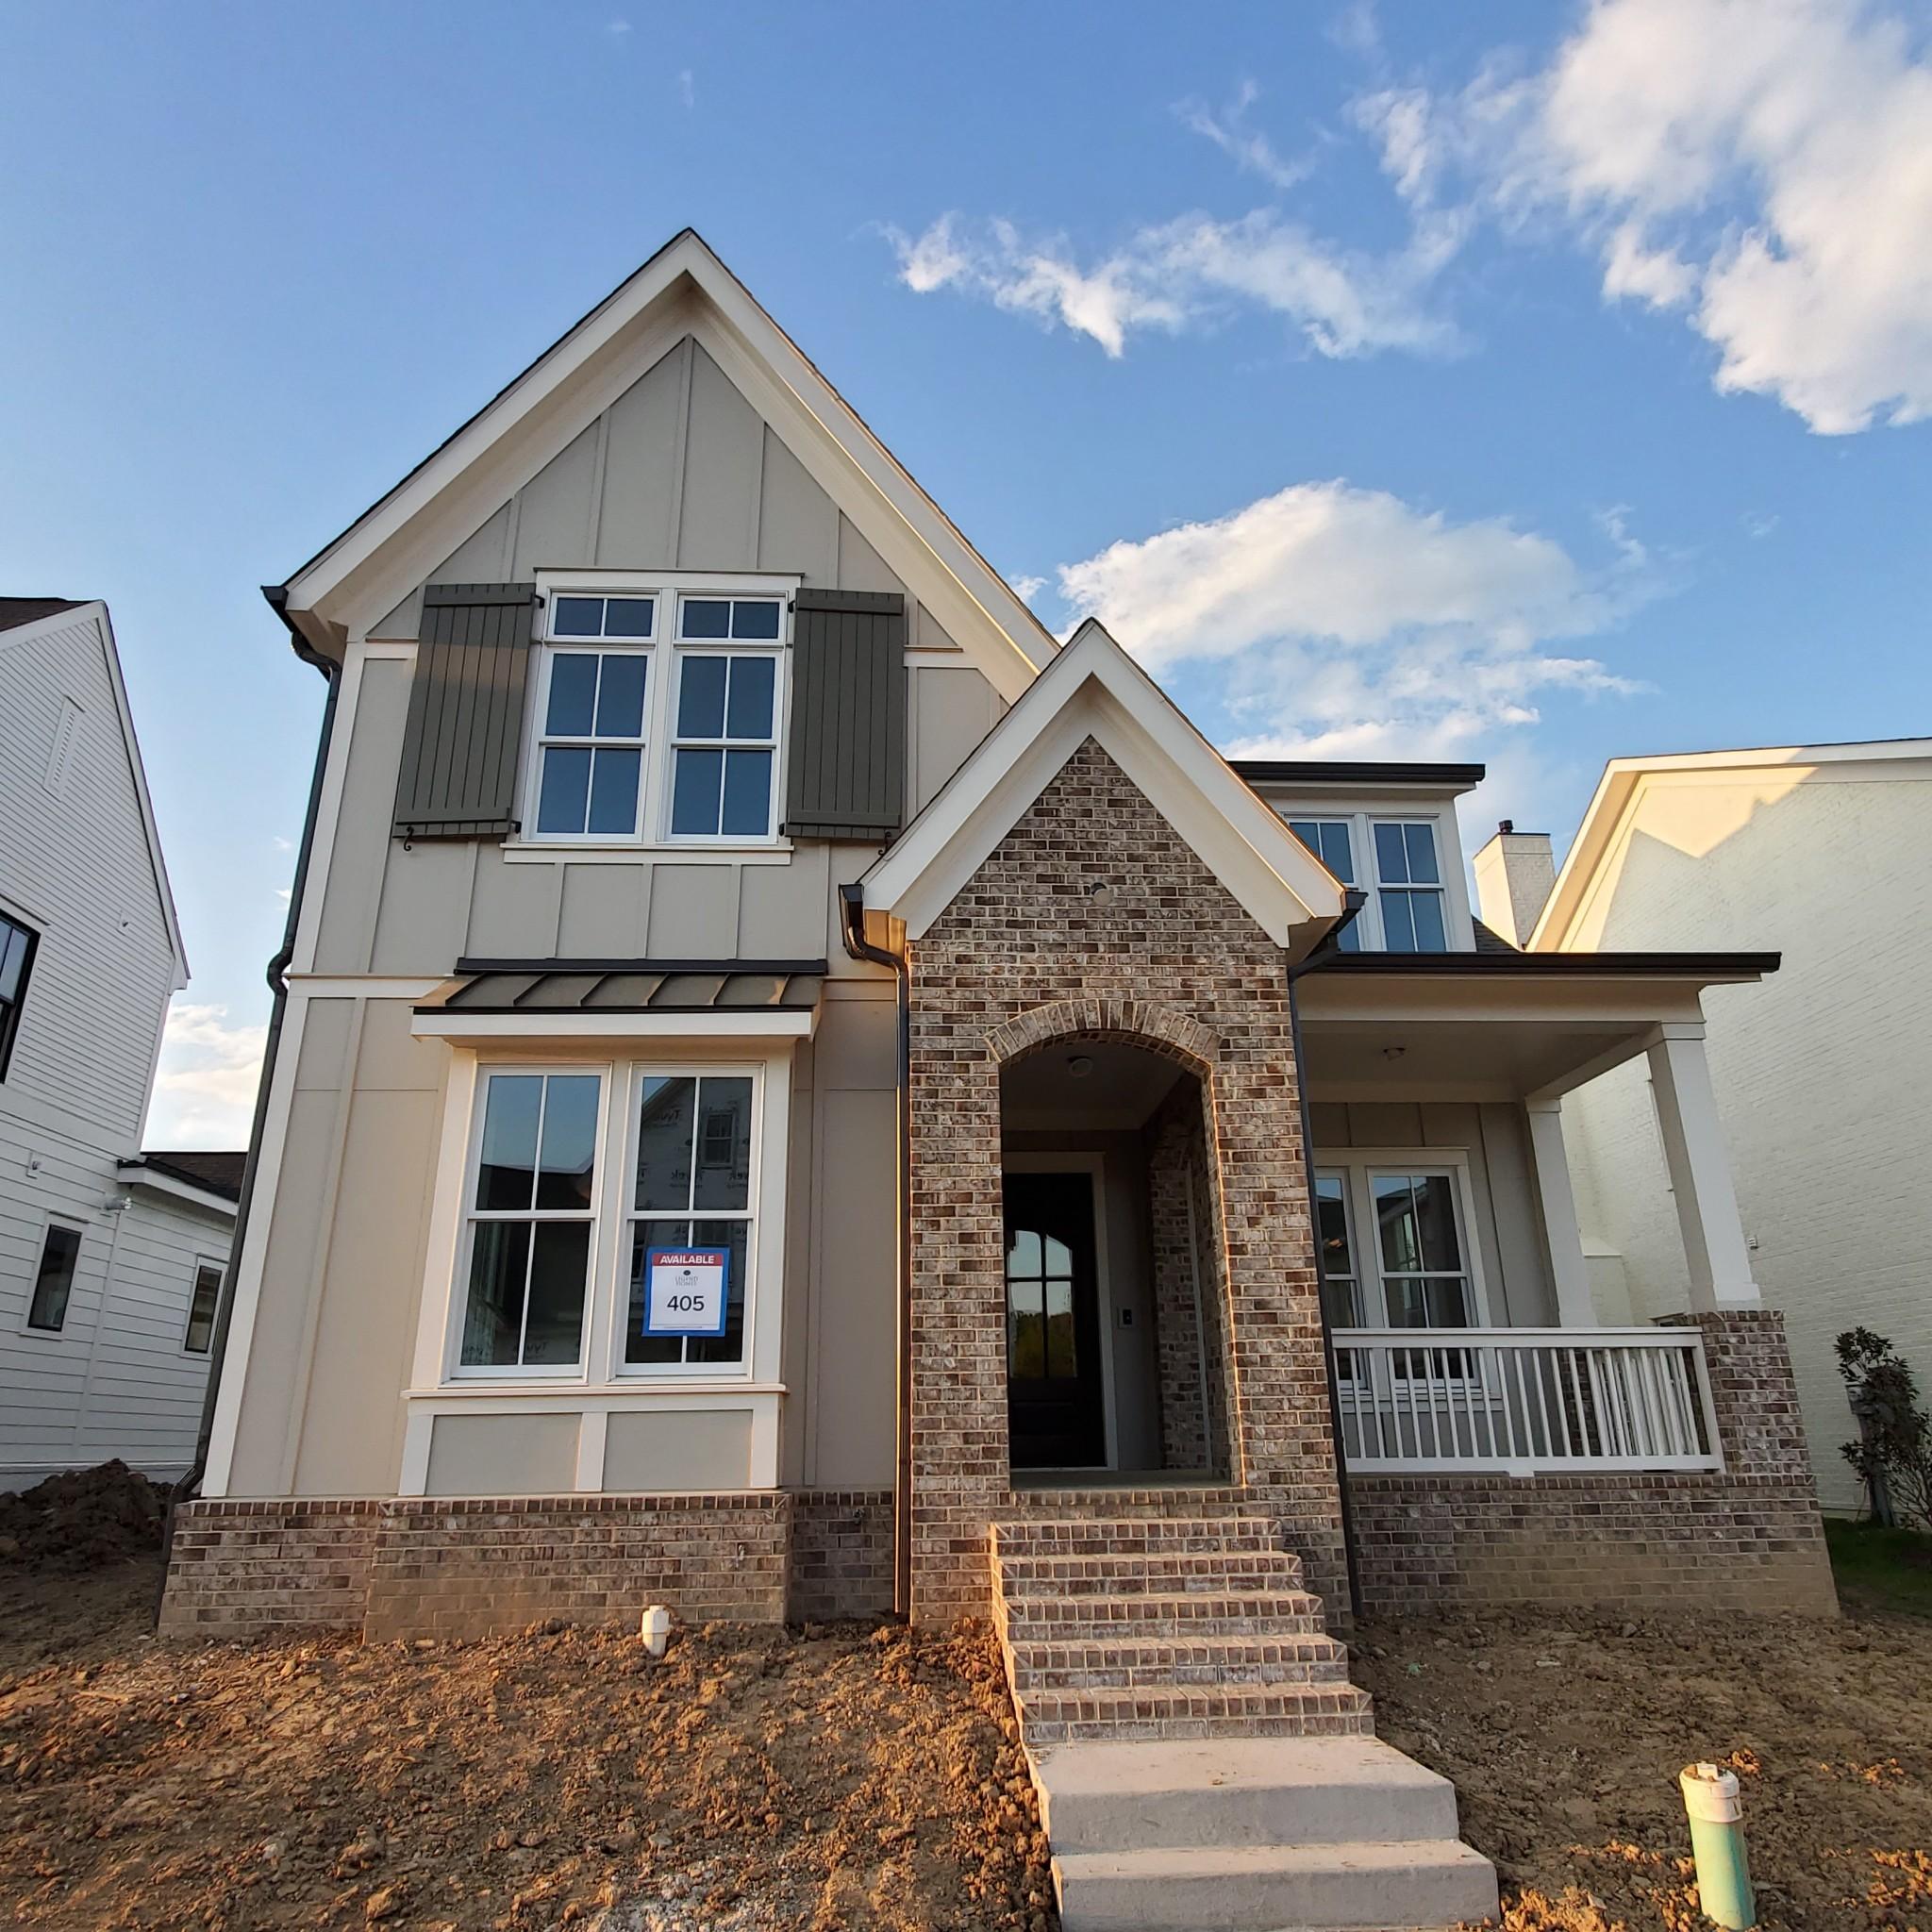 808 Carsten Street-Lot 405, Nashville, TN 37221 - Nashville, TN real estate listing